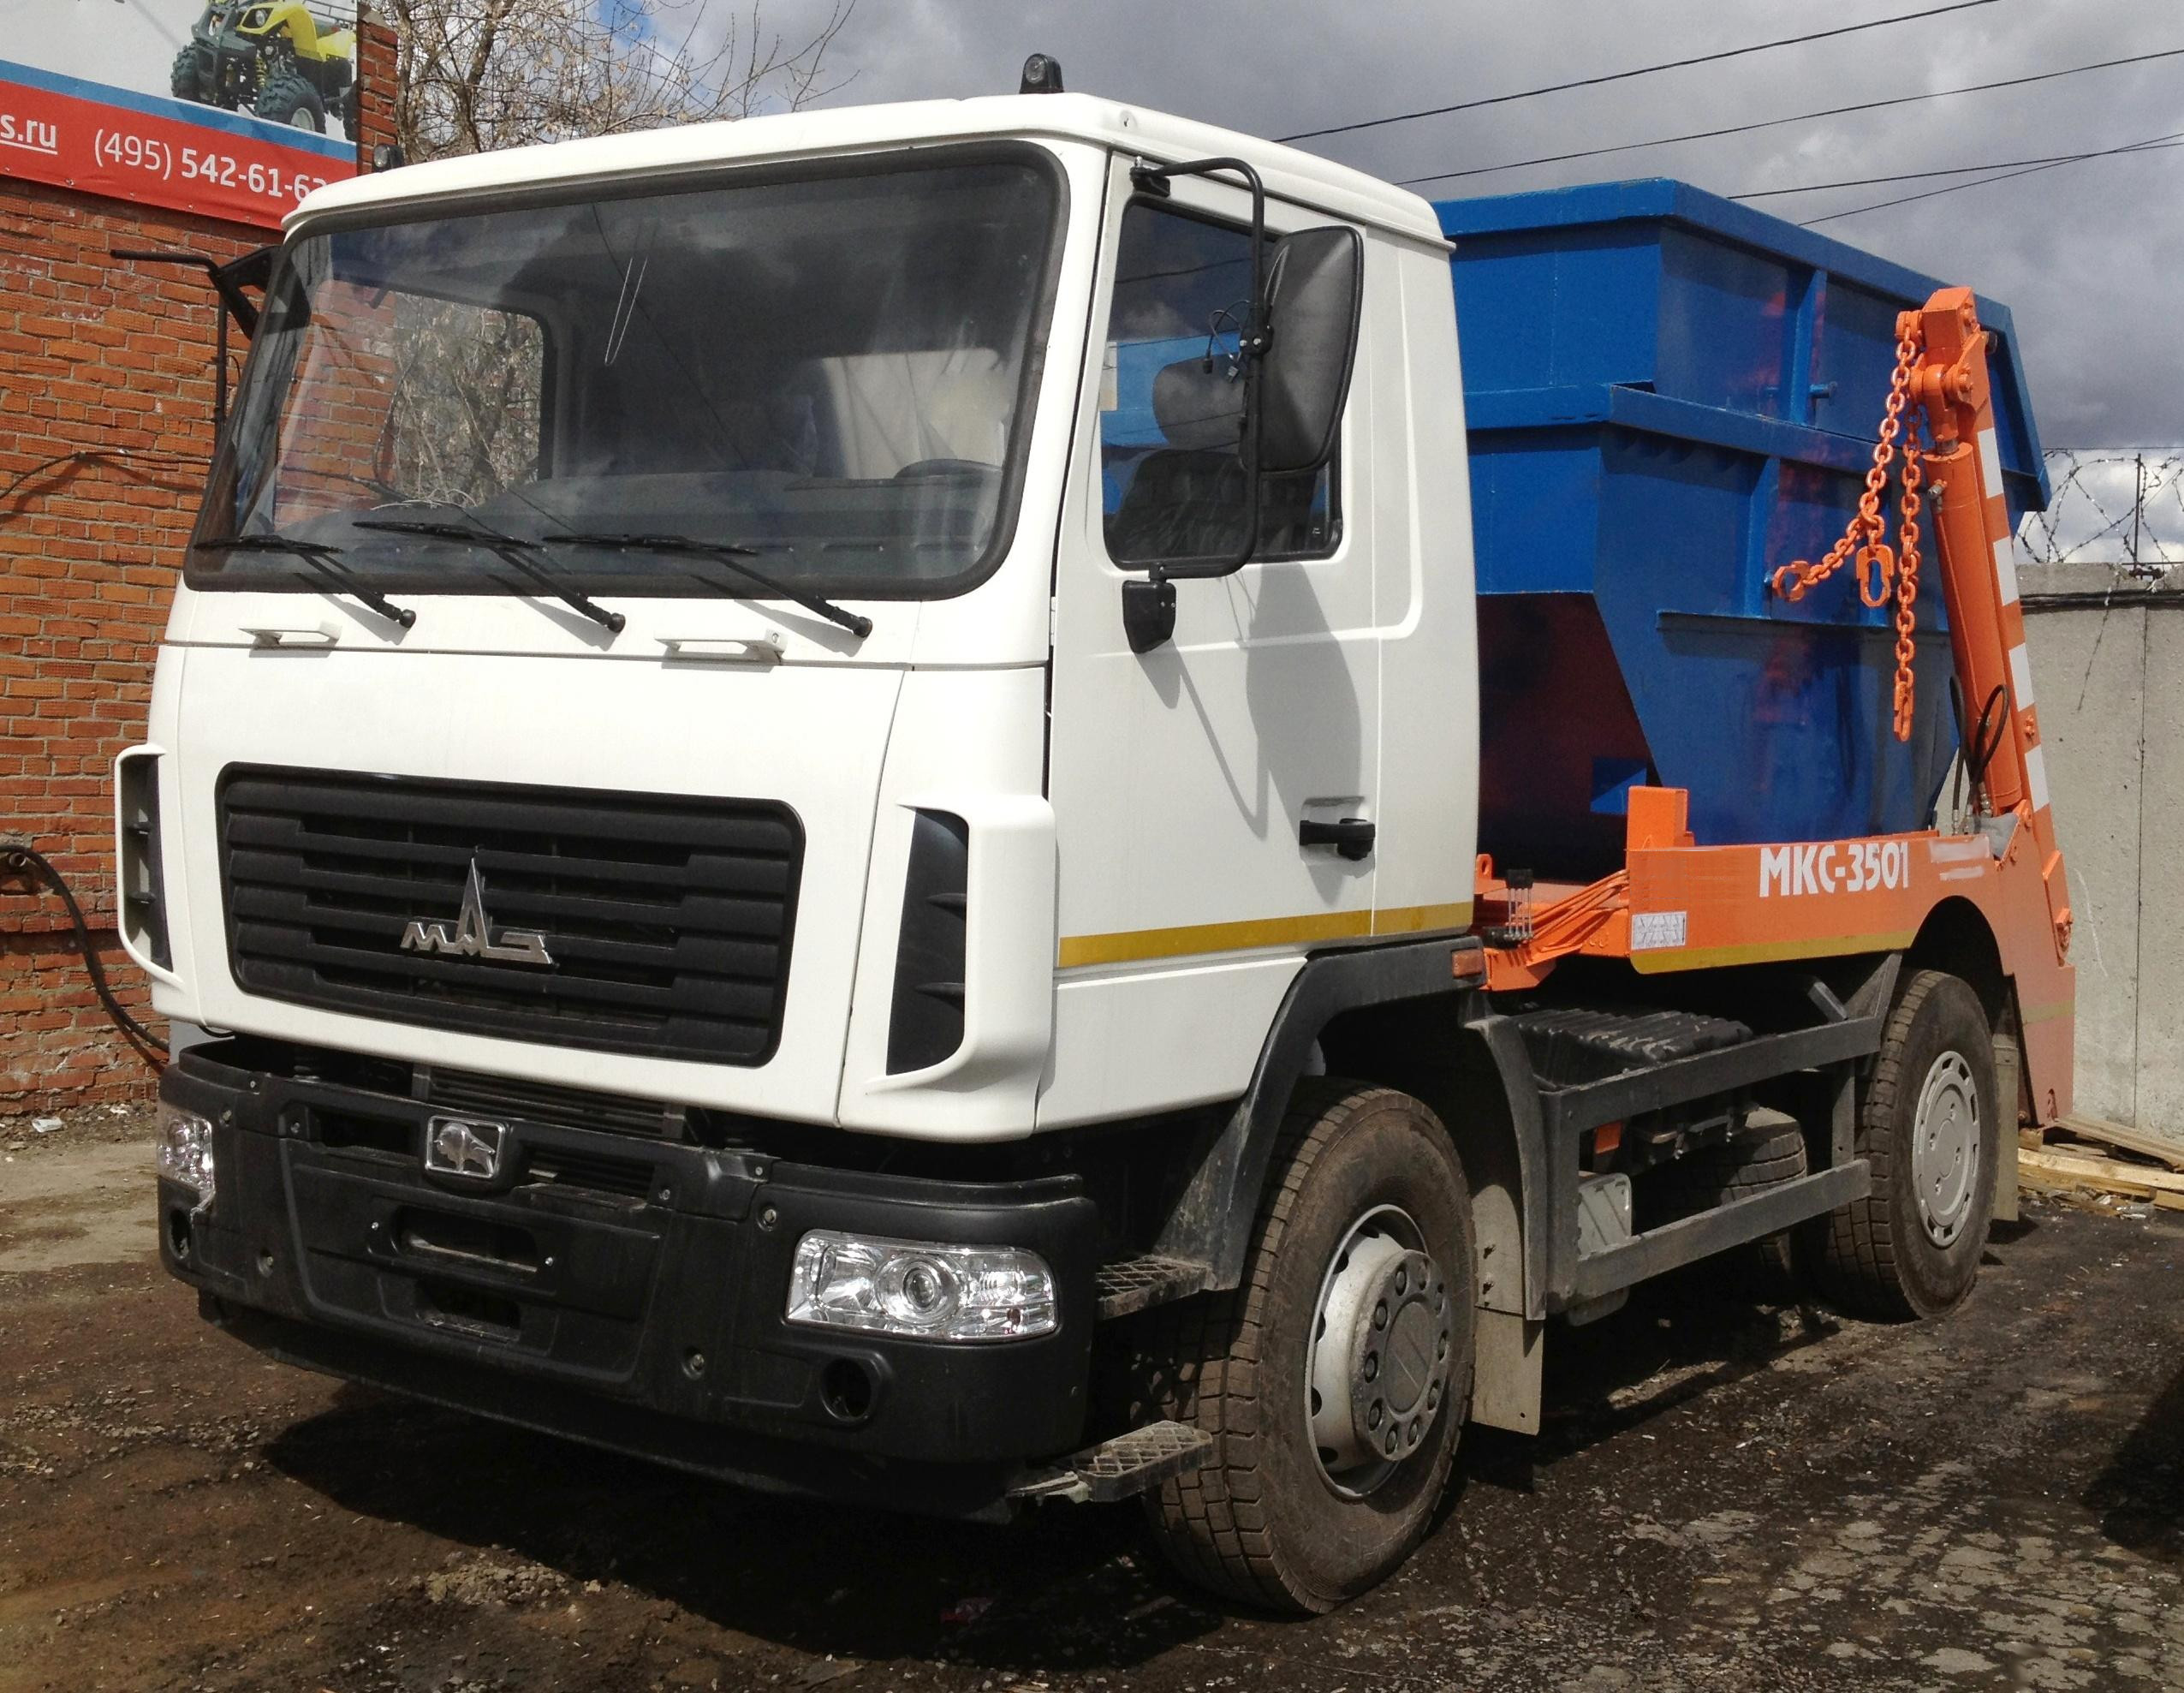 МАЗ МКС-3501 - 8 м3 9 тонн в аренду